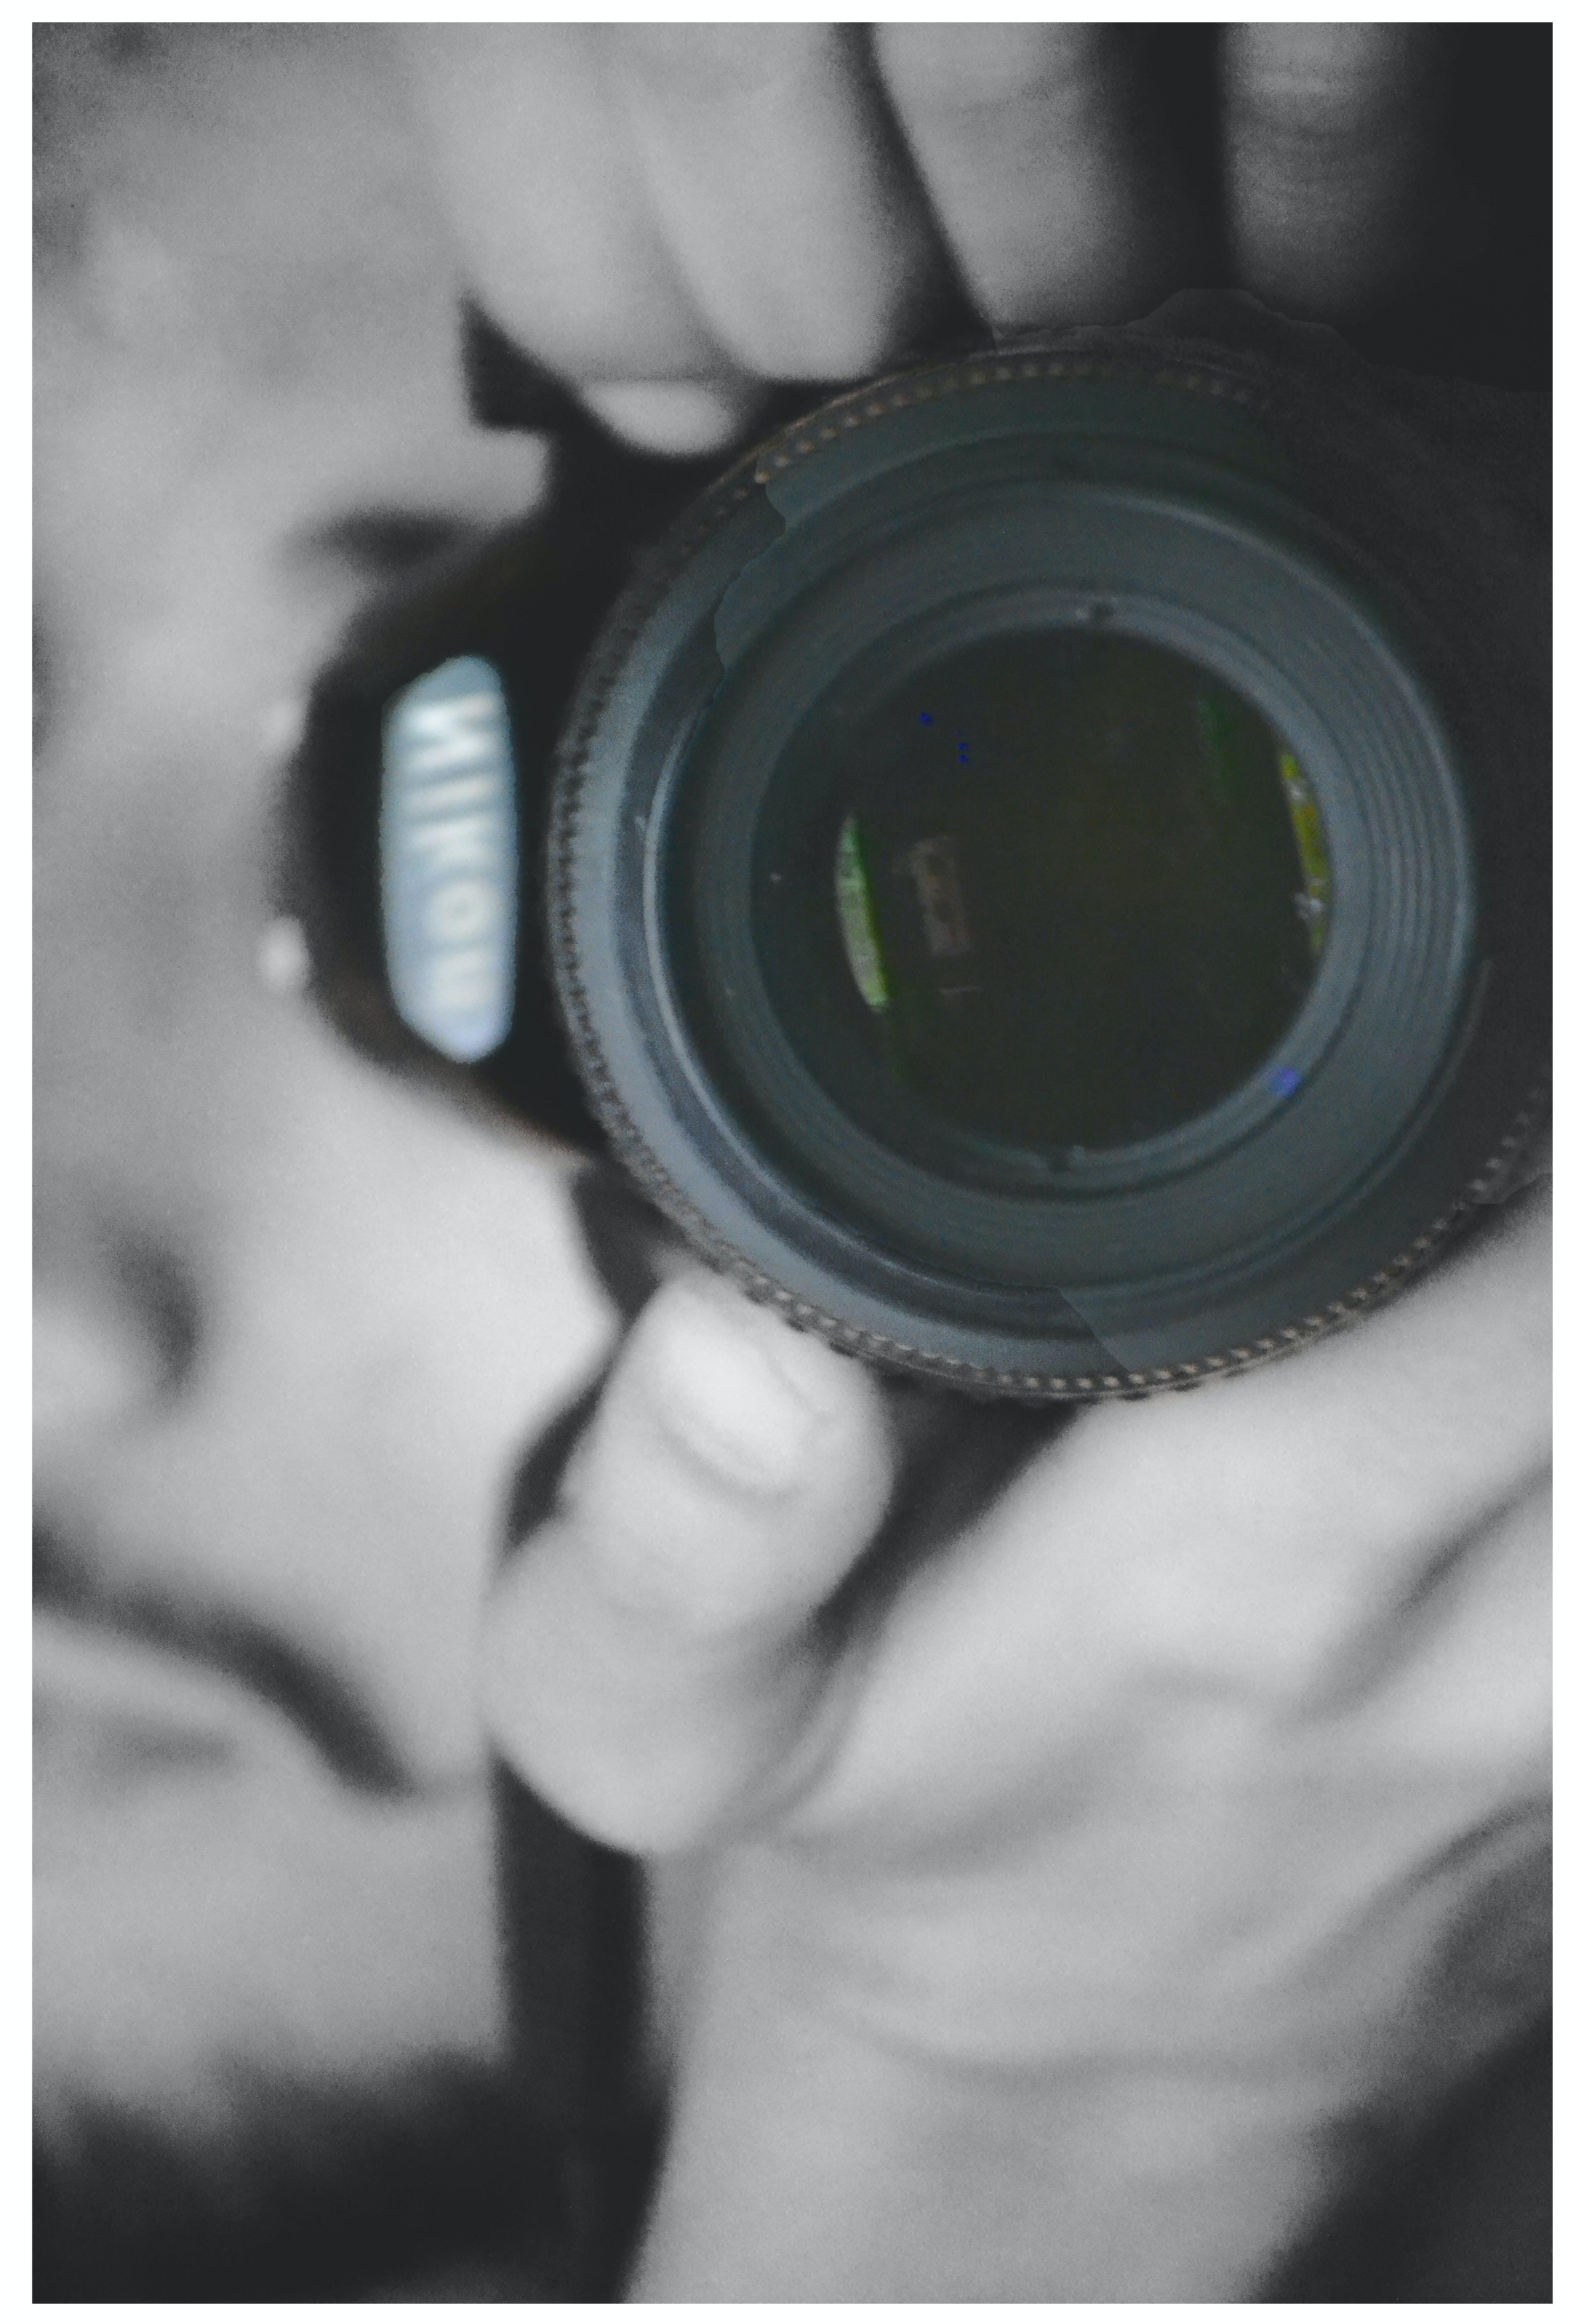 Free stock photo of abstract photo, Adobe Photoshop, dslr, man